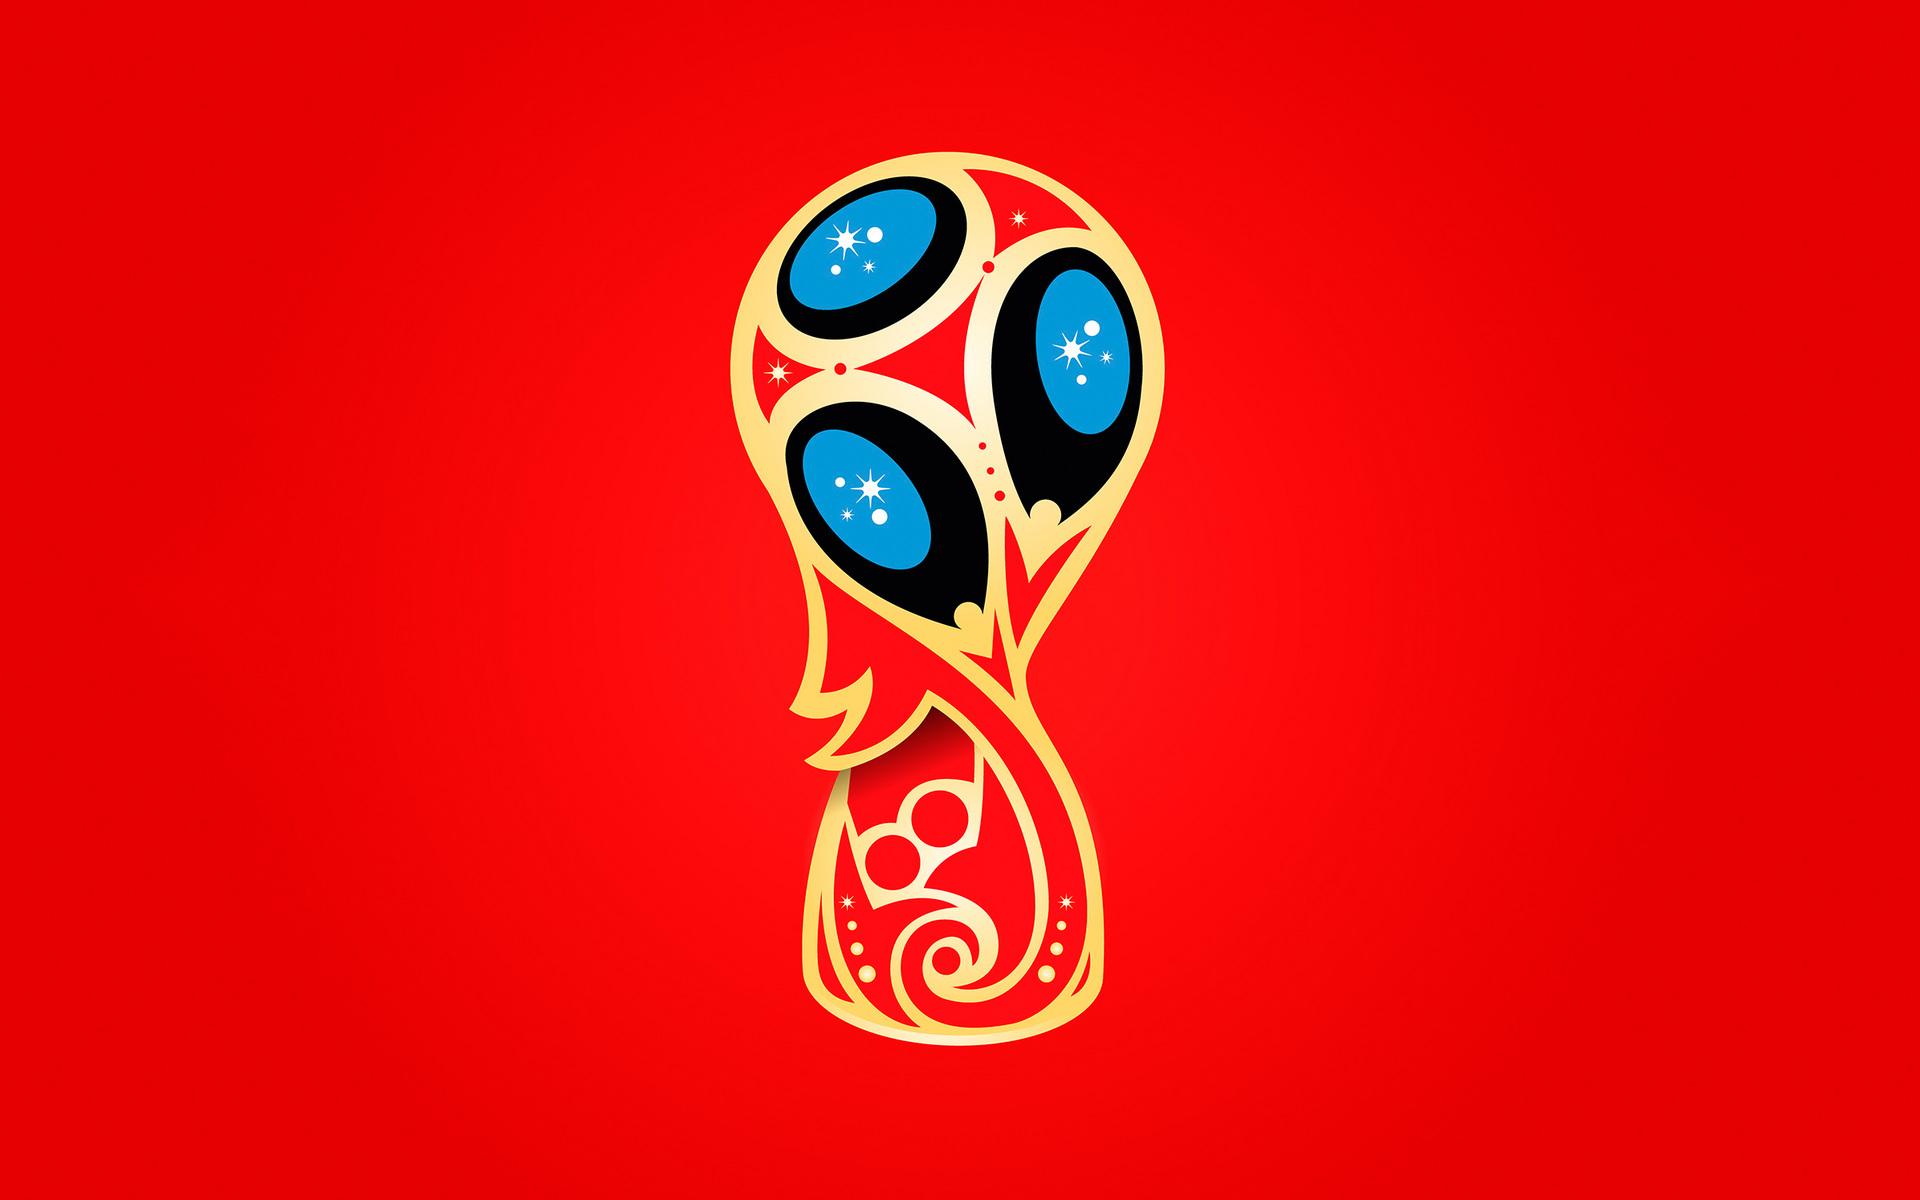 Картинка чемпионата мира по футболу 2018, поздравление днем